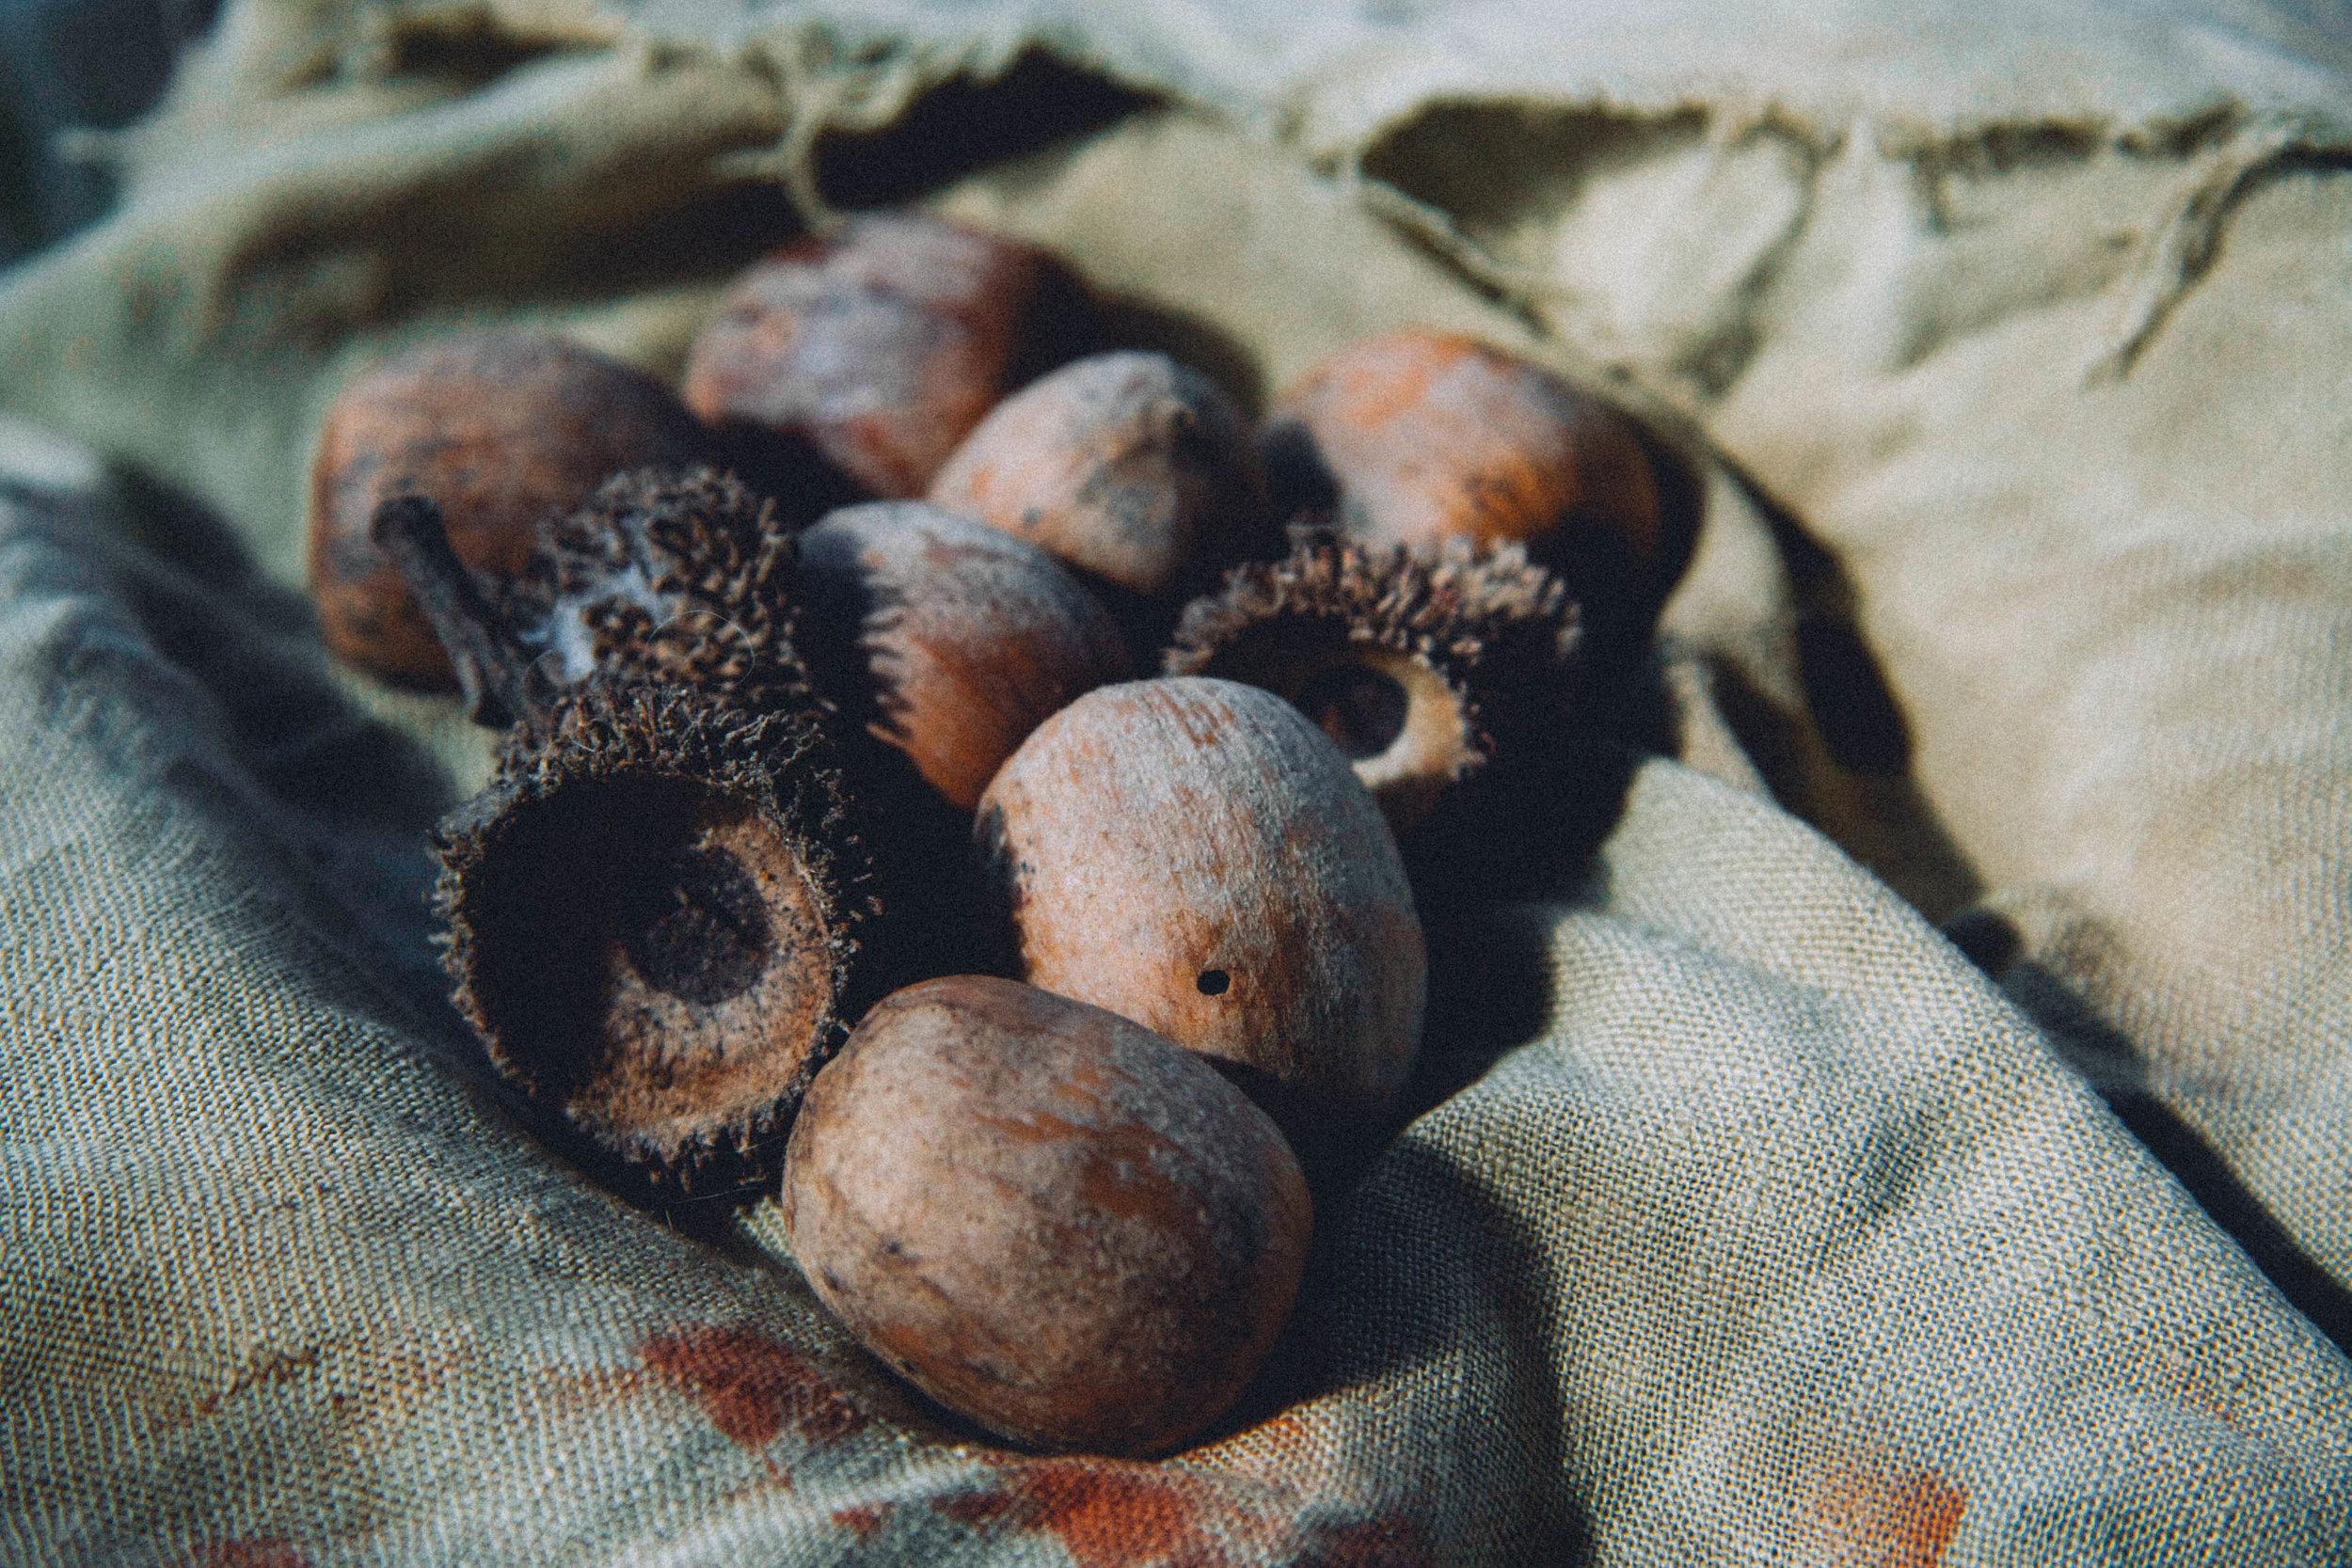 Tanbark cup and acorns.